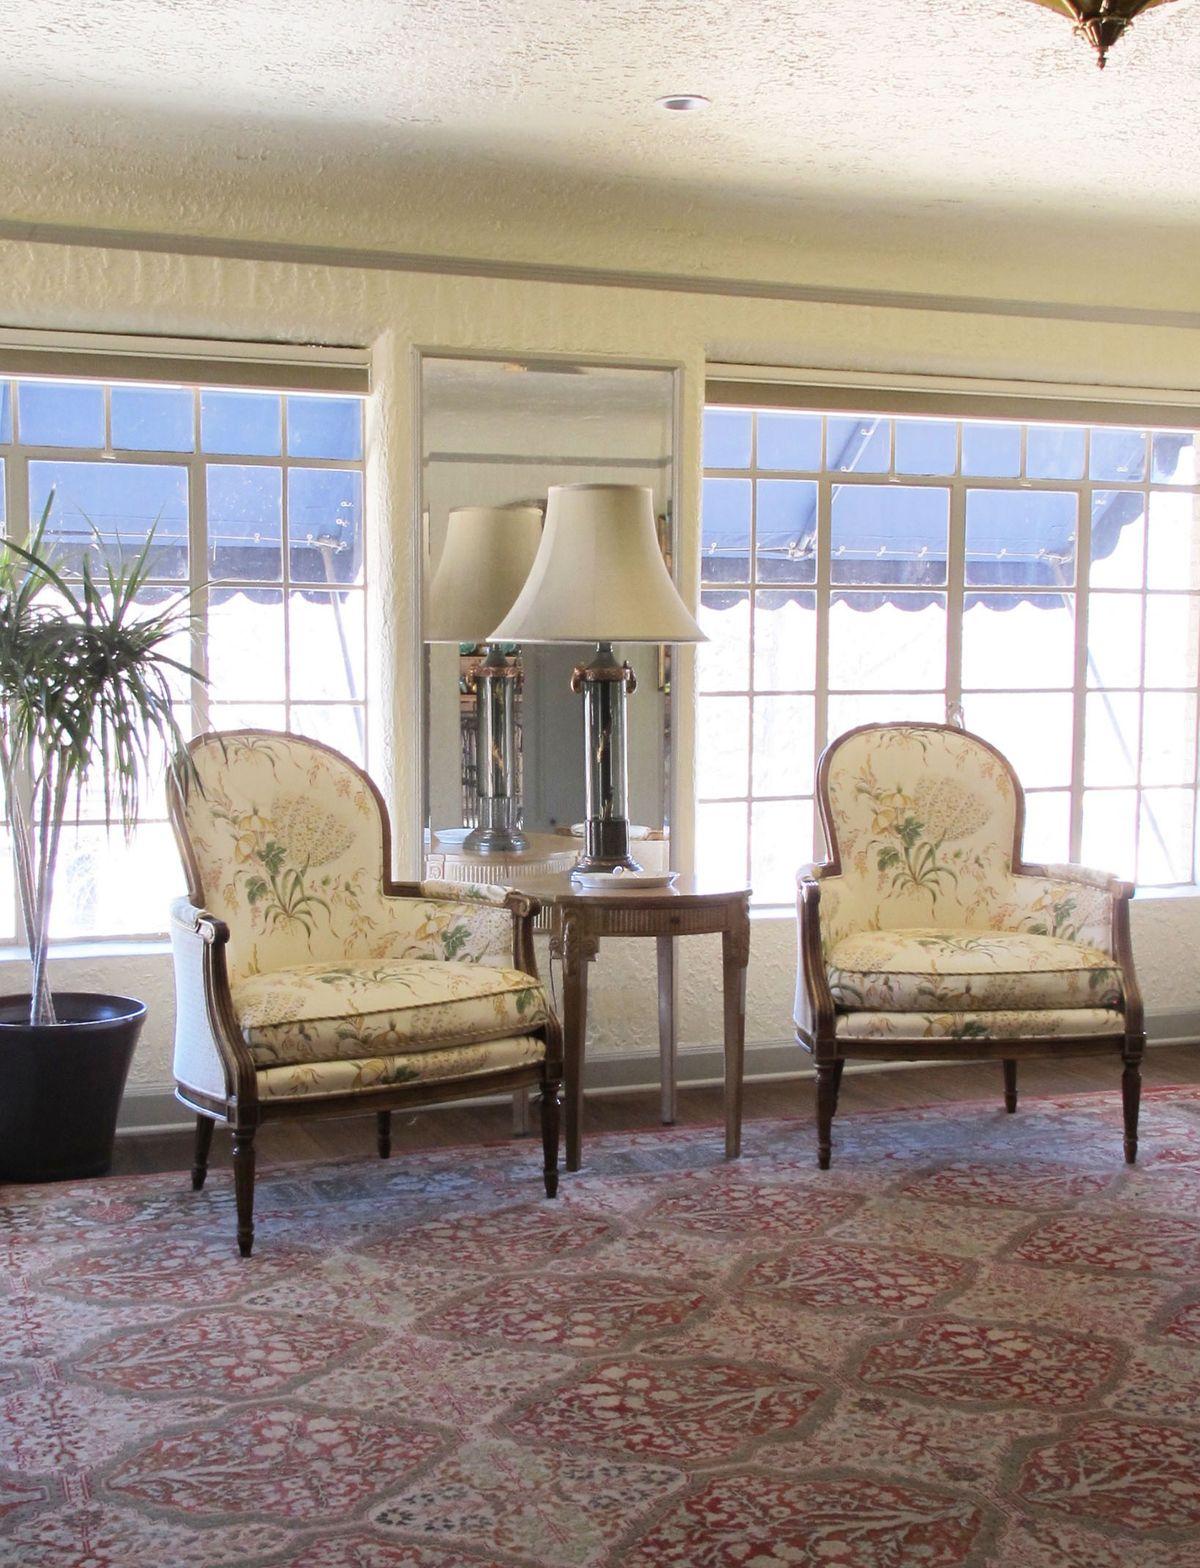 Historic Hutsell Mediterranean Home Photo Video Shoot Location 43.jpg